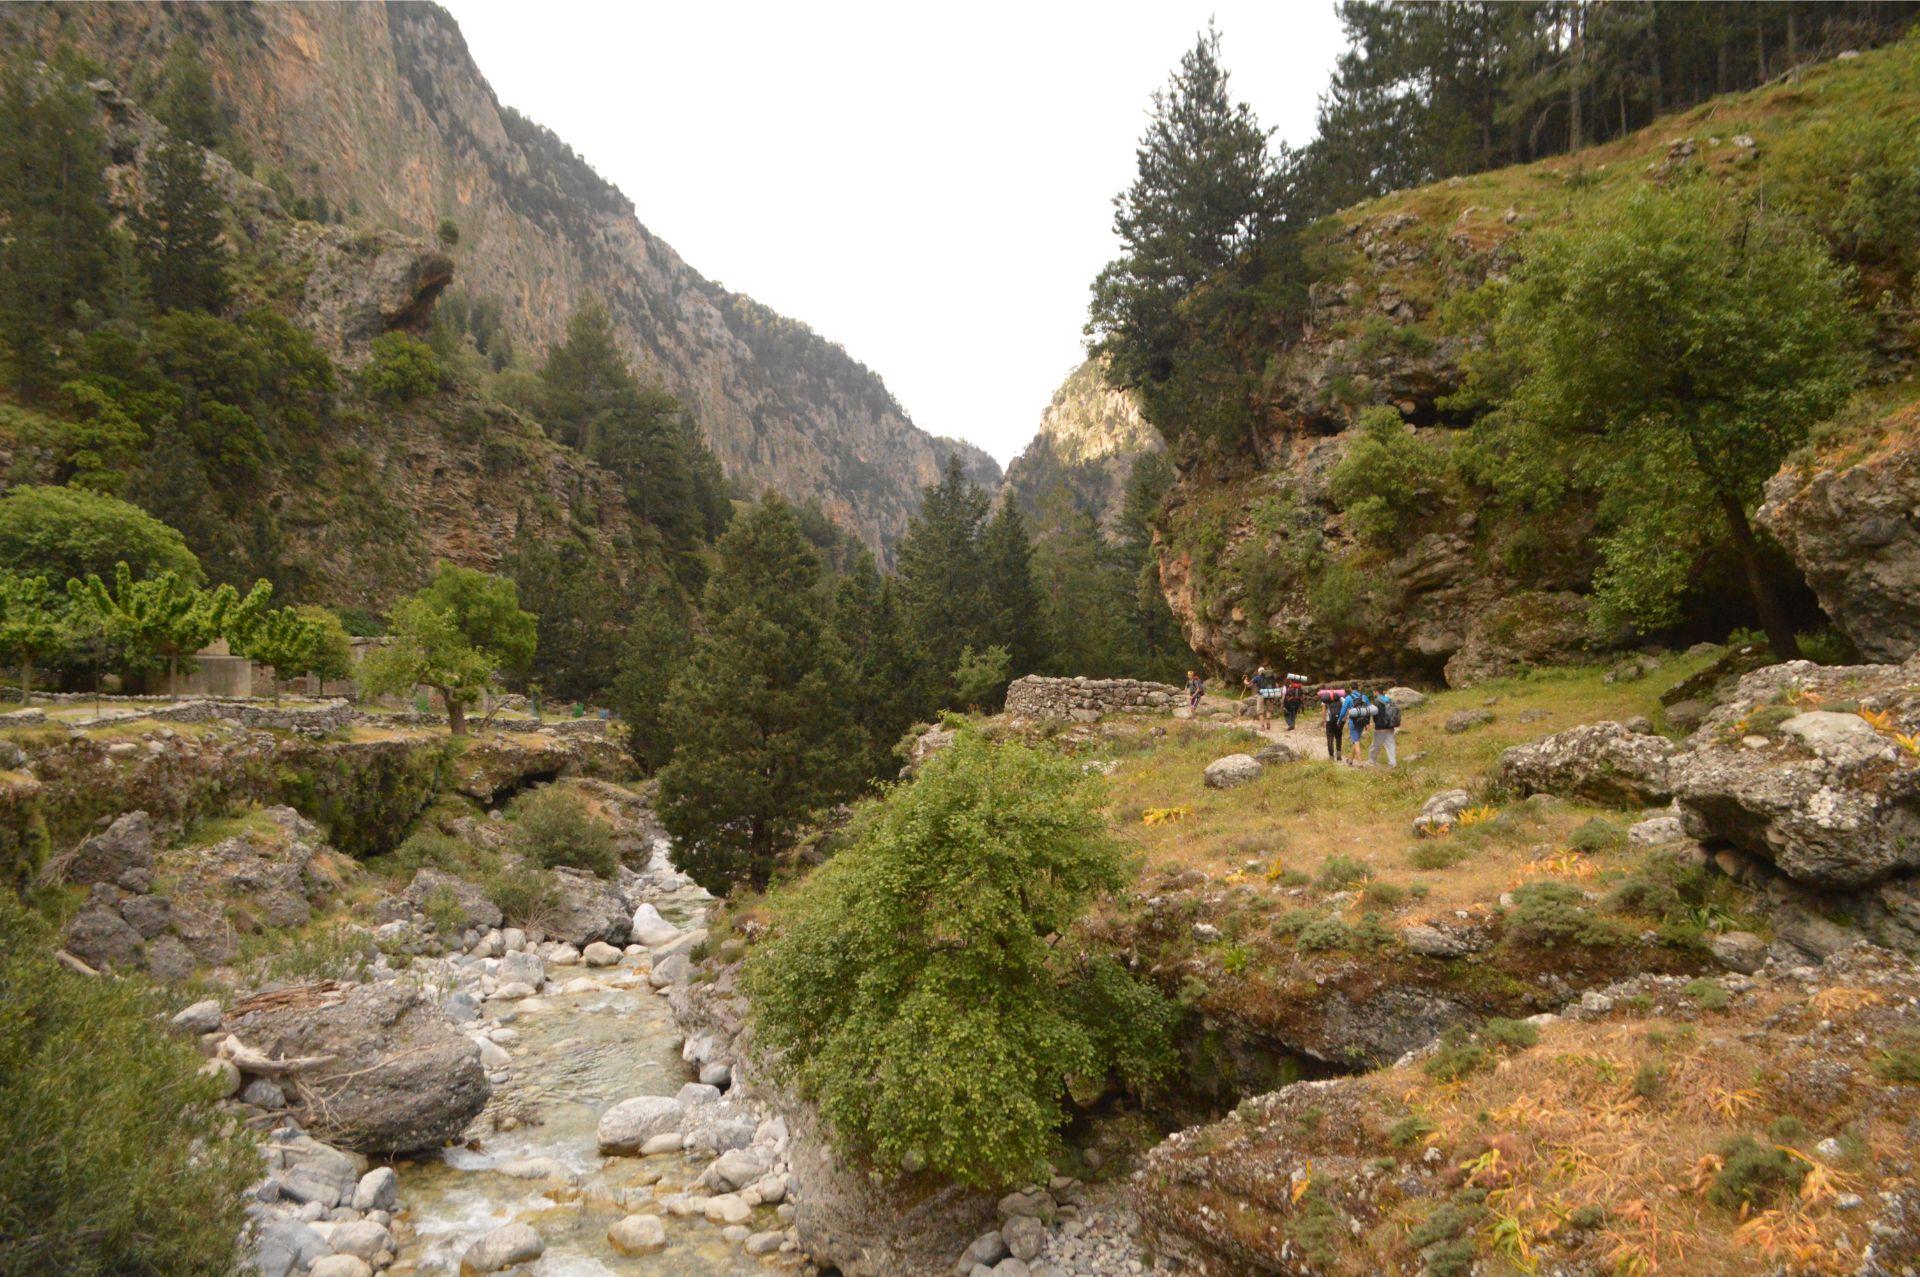 Evenos_Travel_Voidodema_Omalos_Samaria_2_day_hiking_trip_Samaria_gorge_2day (6)